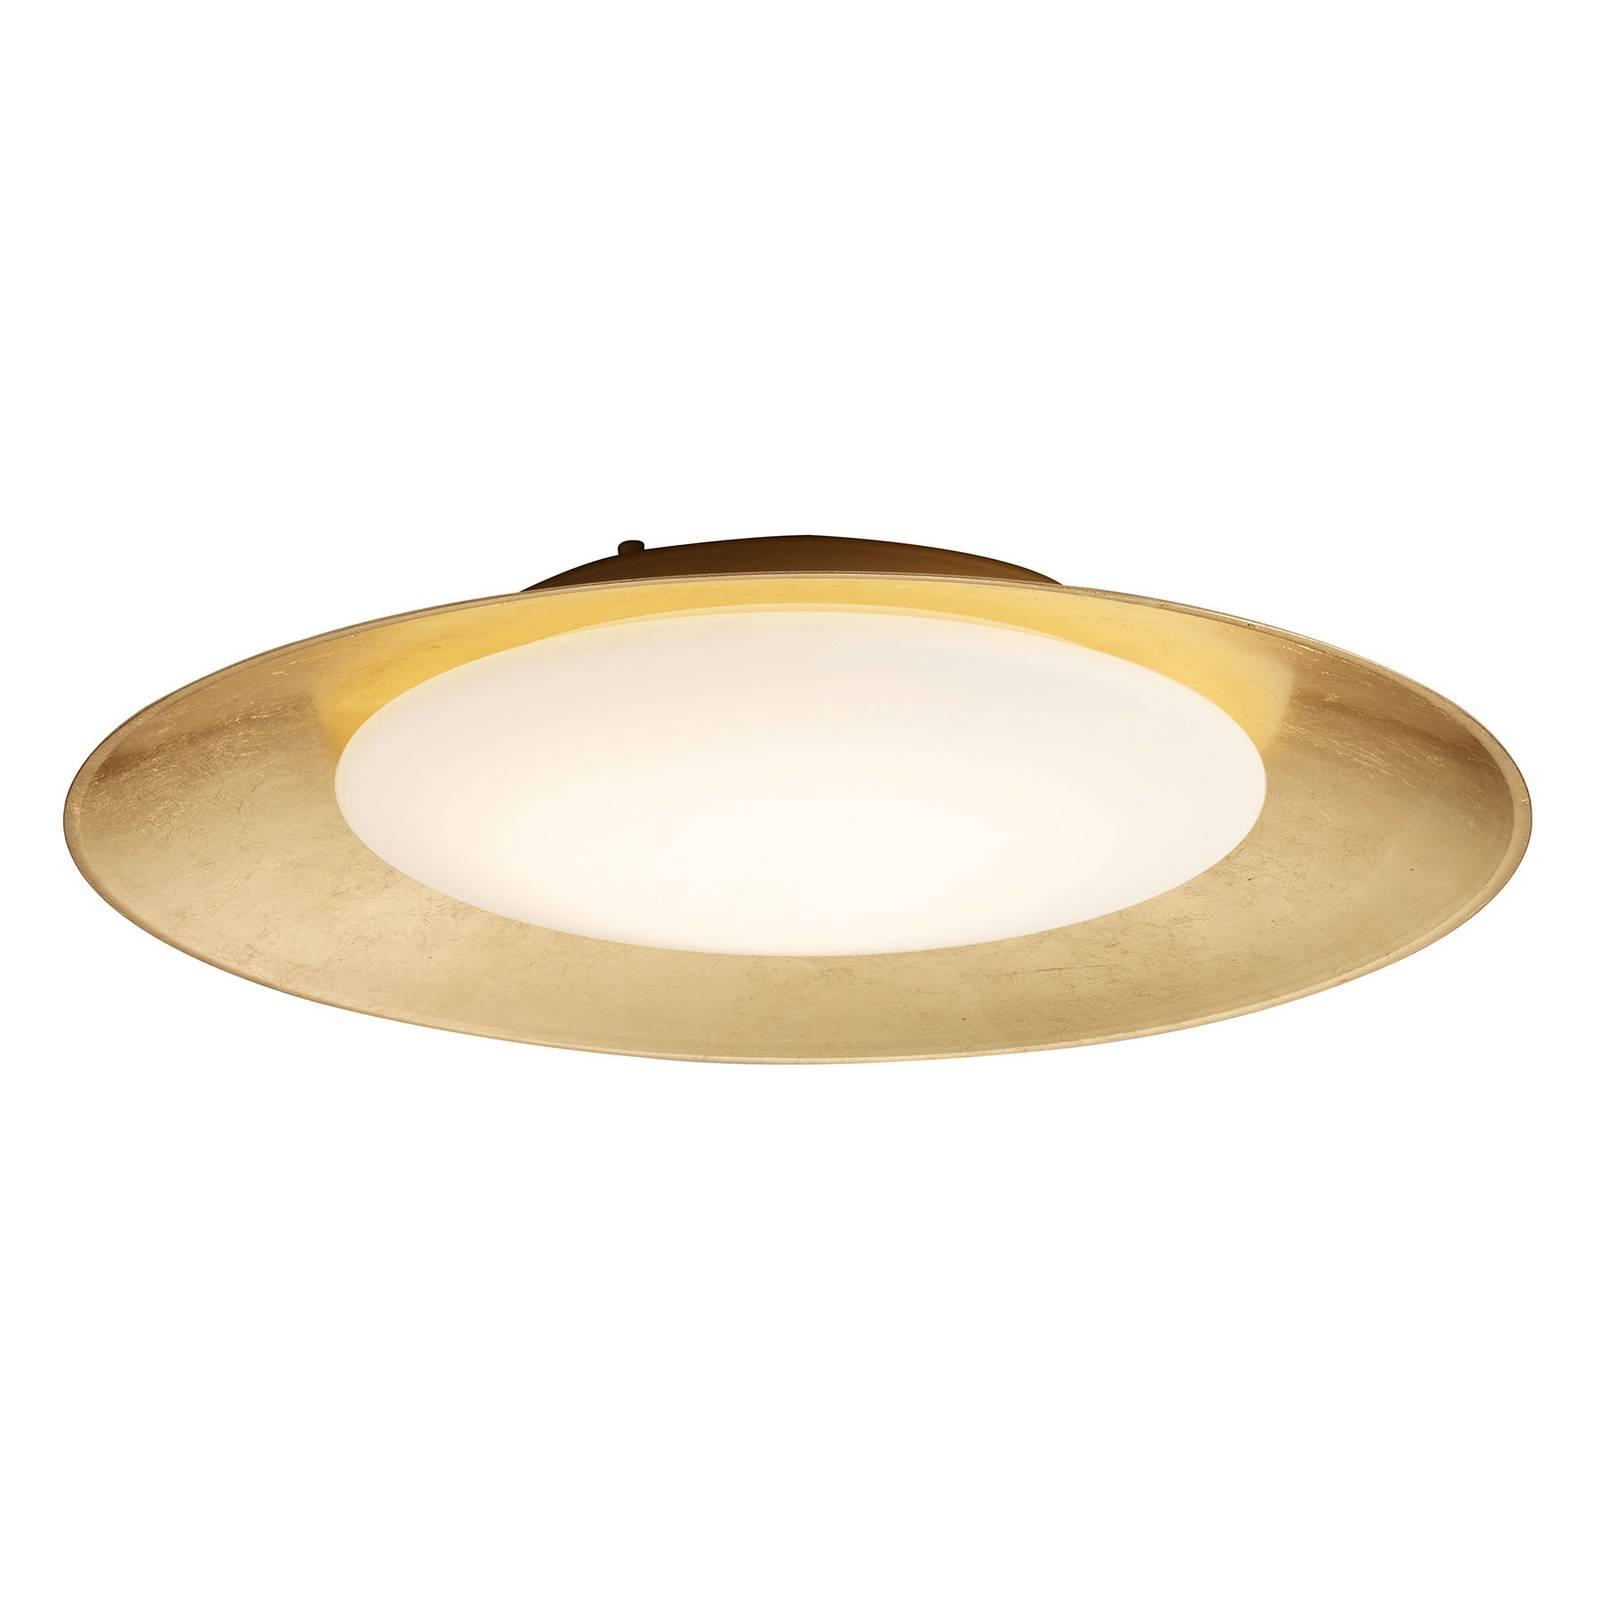 BANKAMP Cover LED-Deckenleuchte Ø41cm blattgold